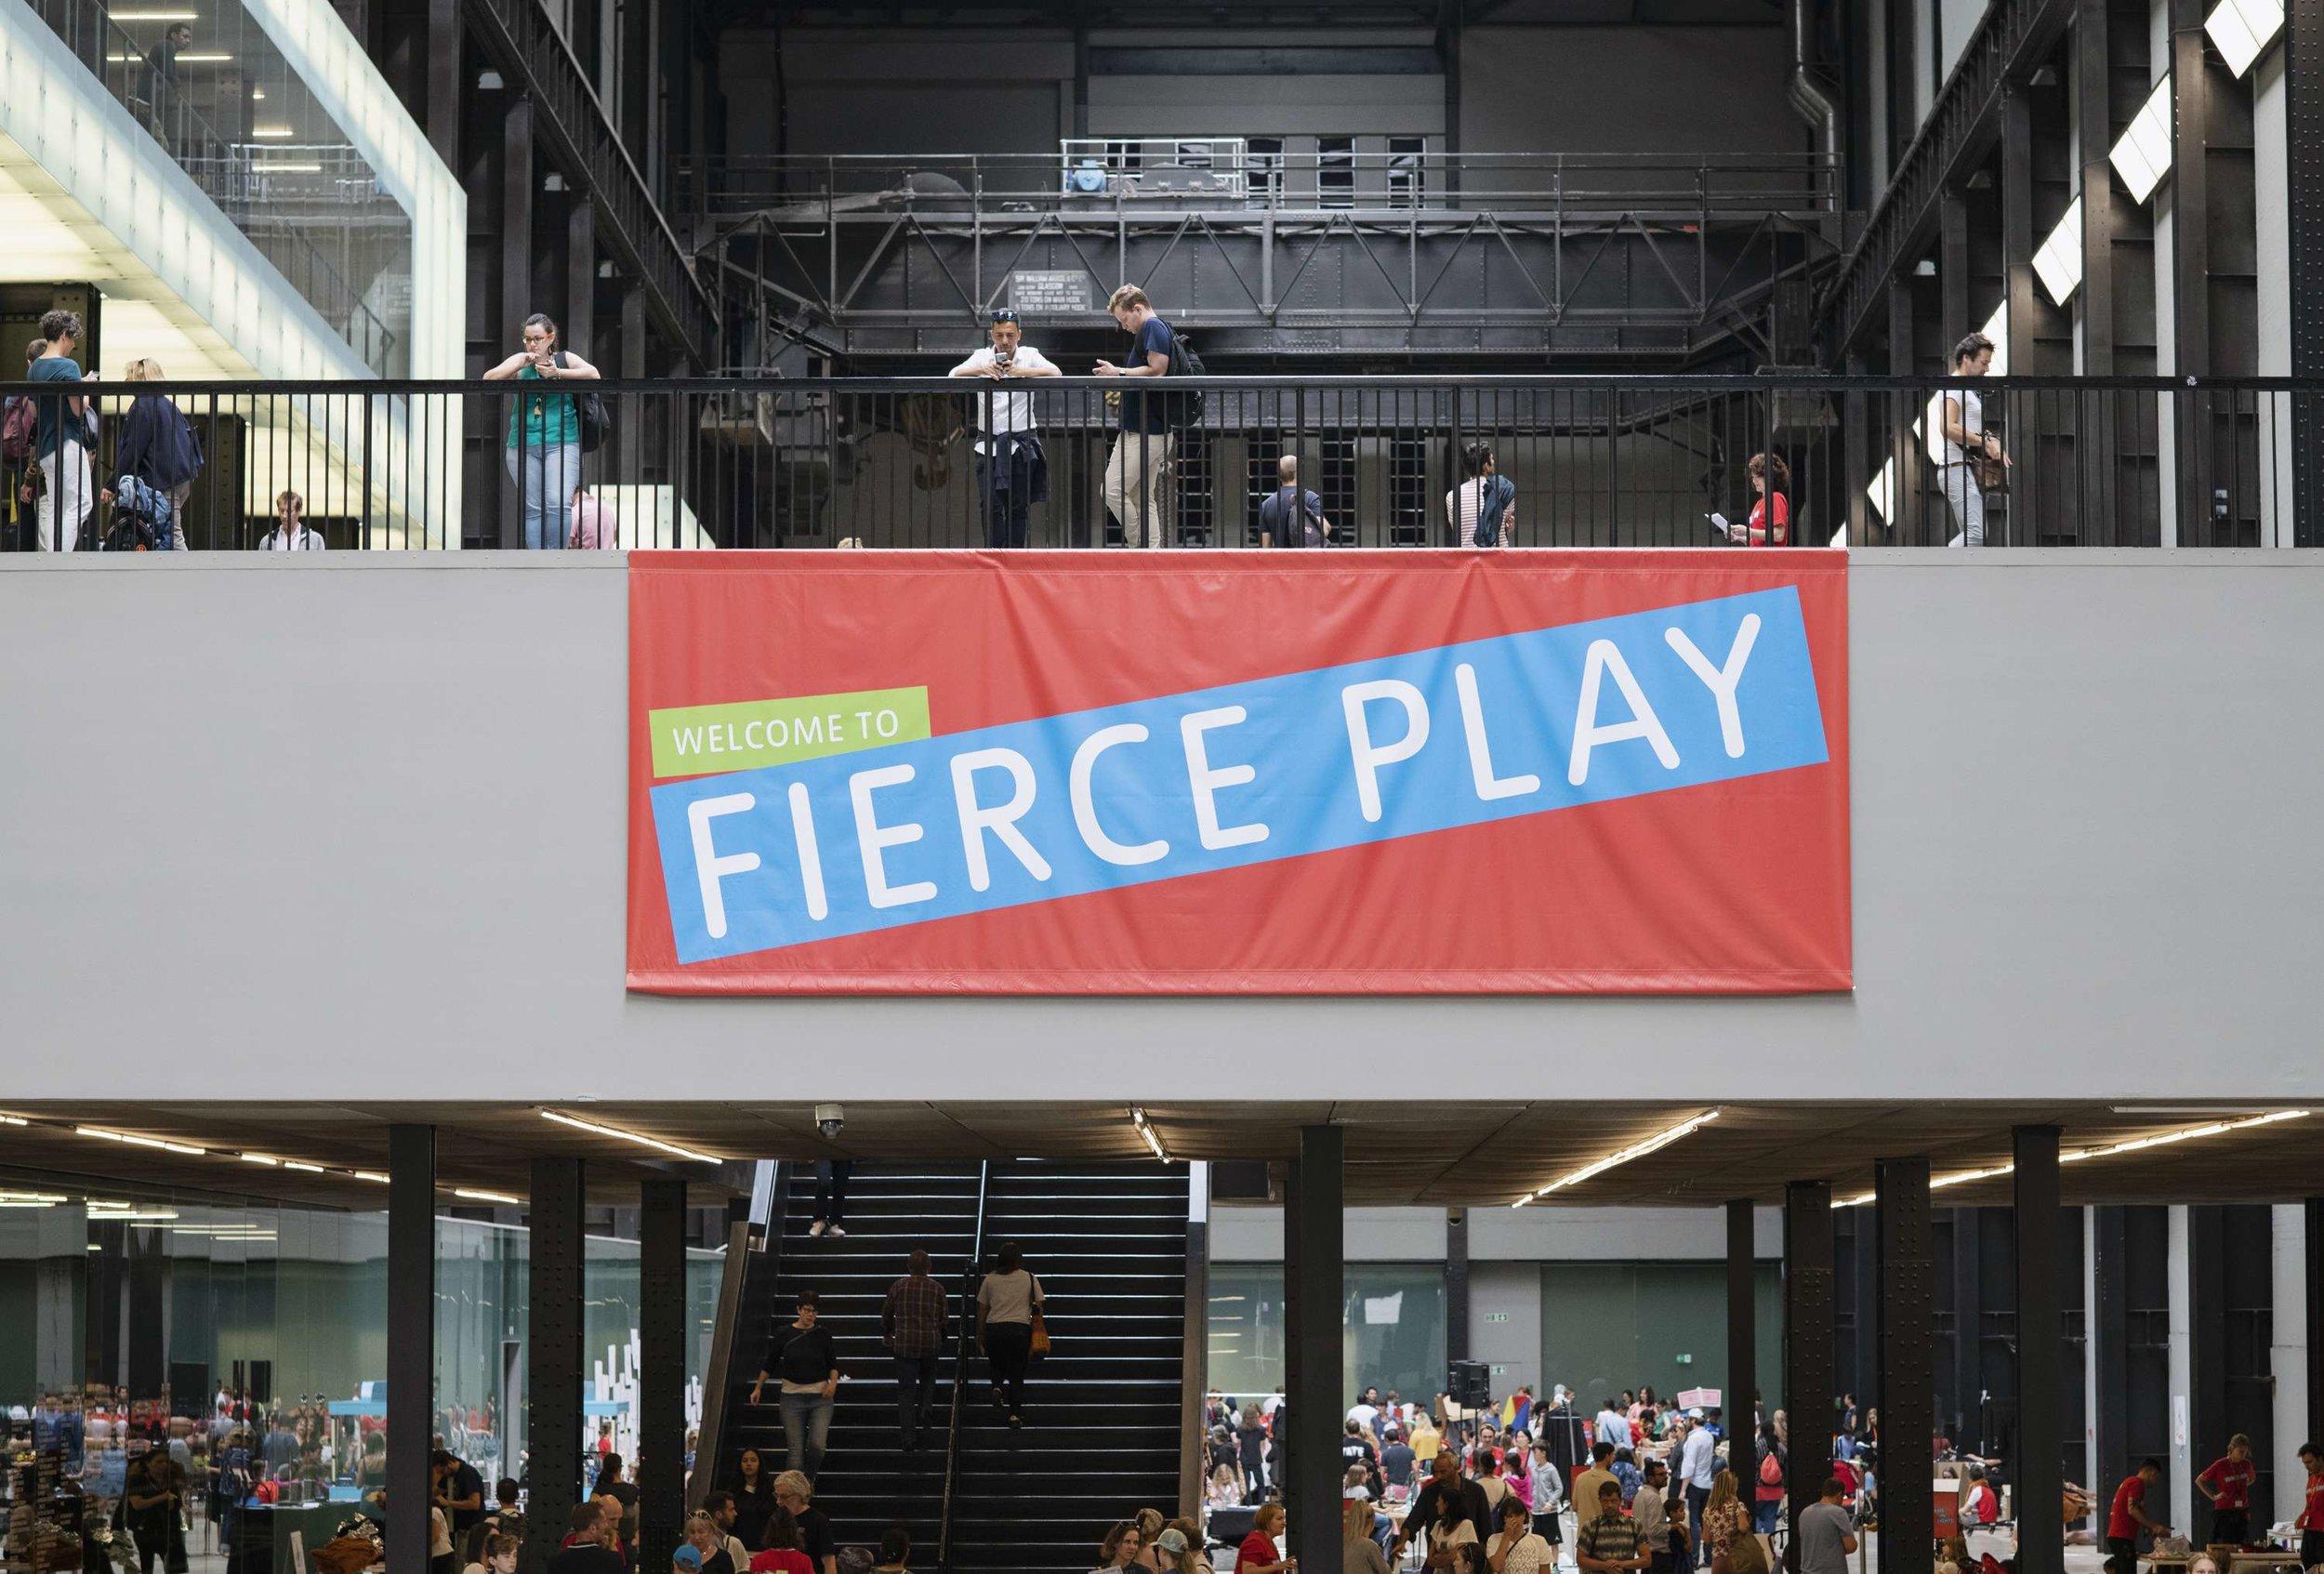 fierce-play021.jpeg